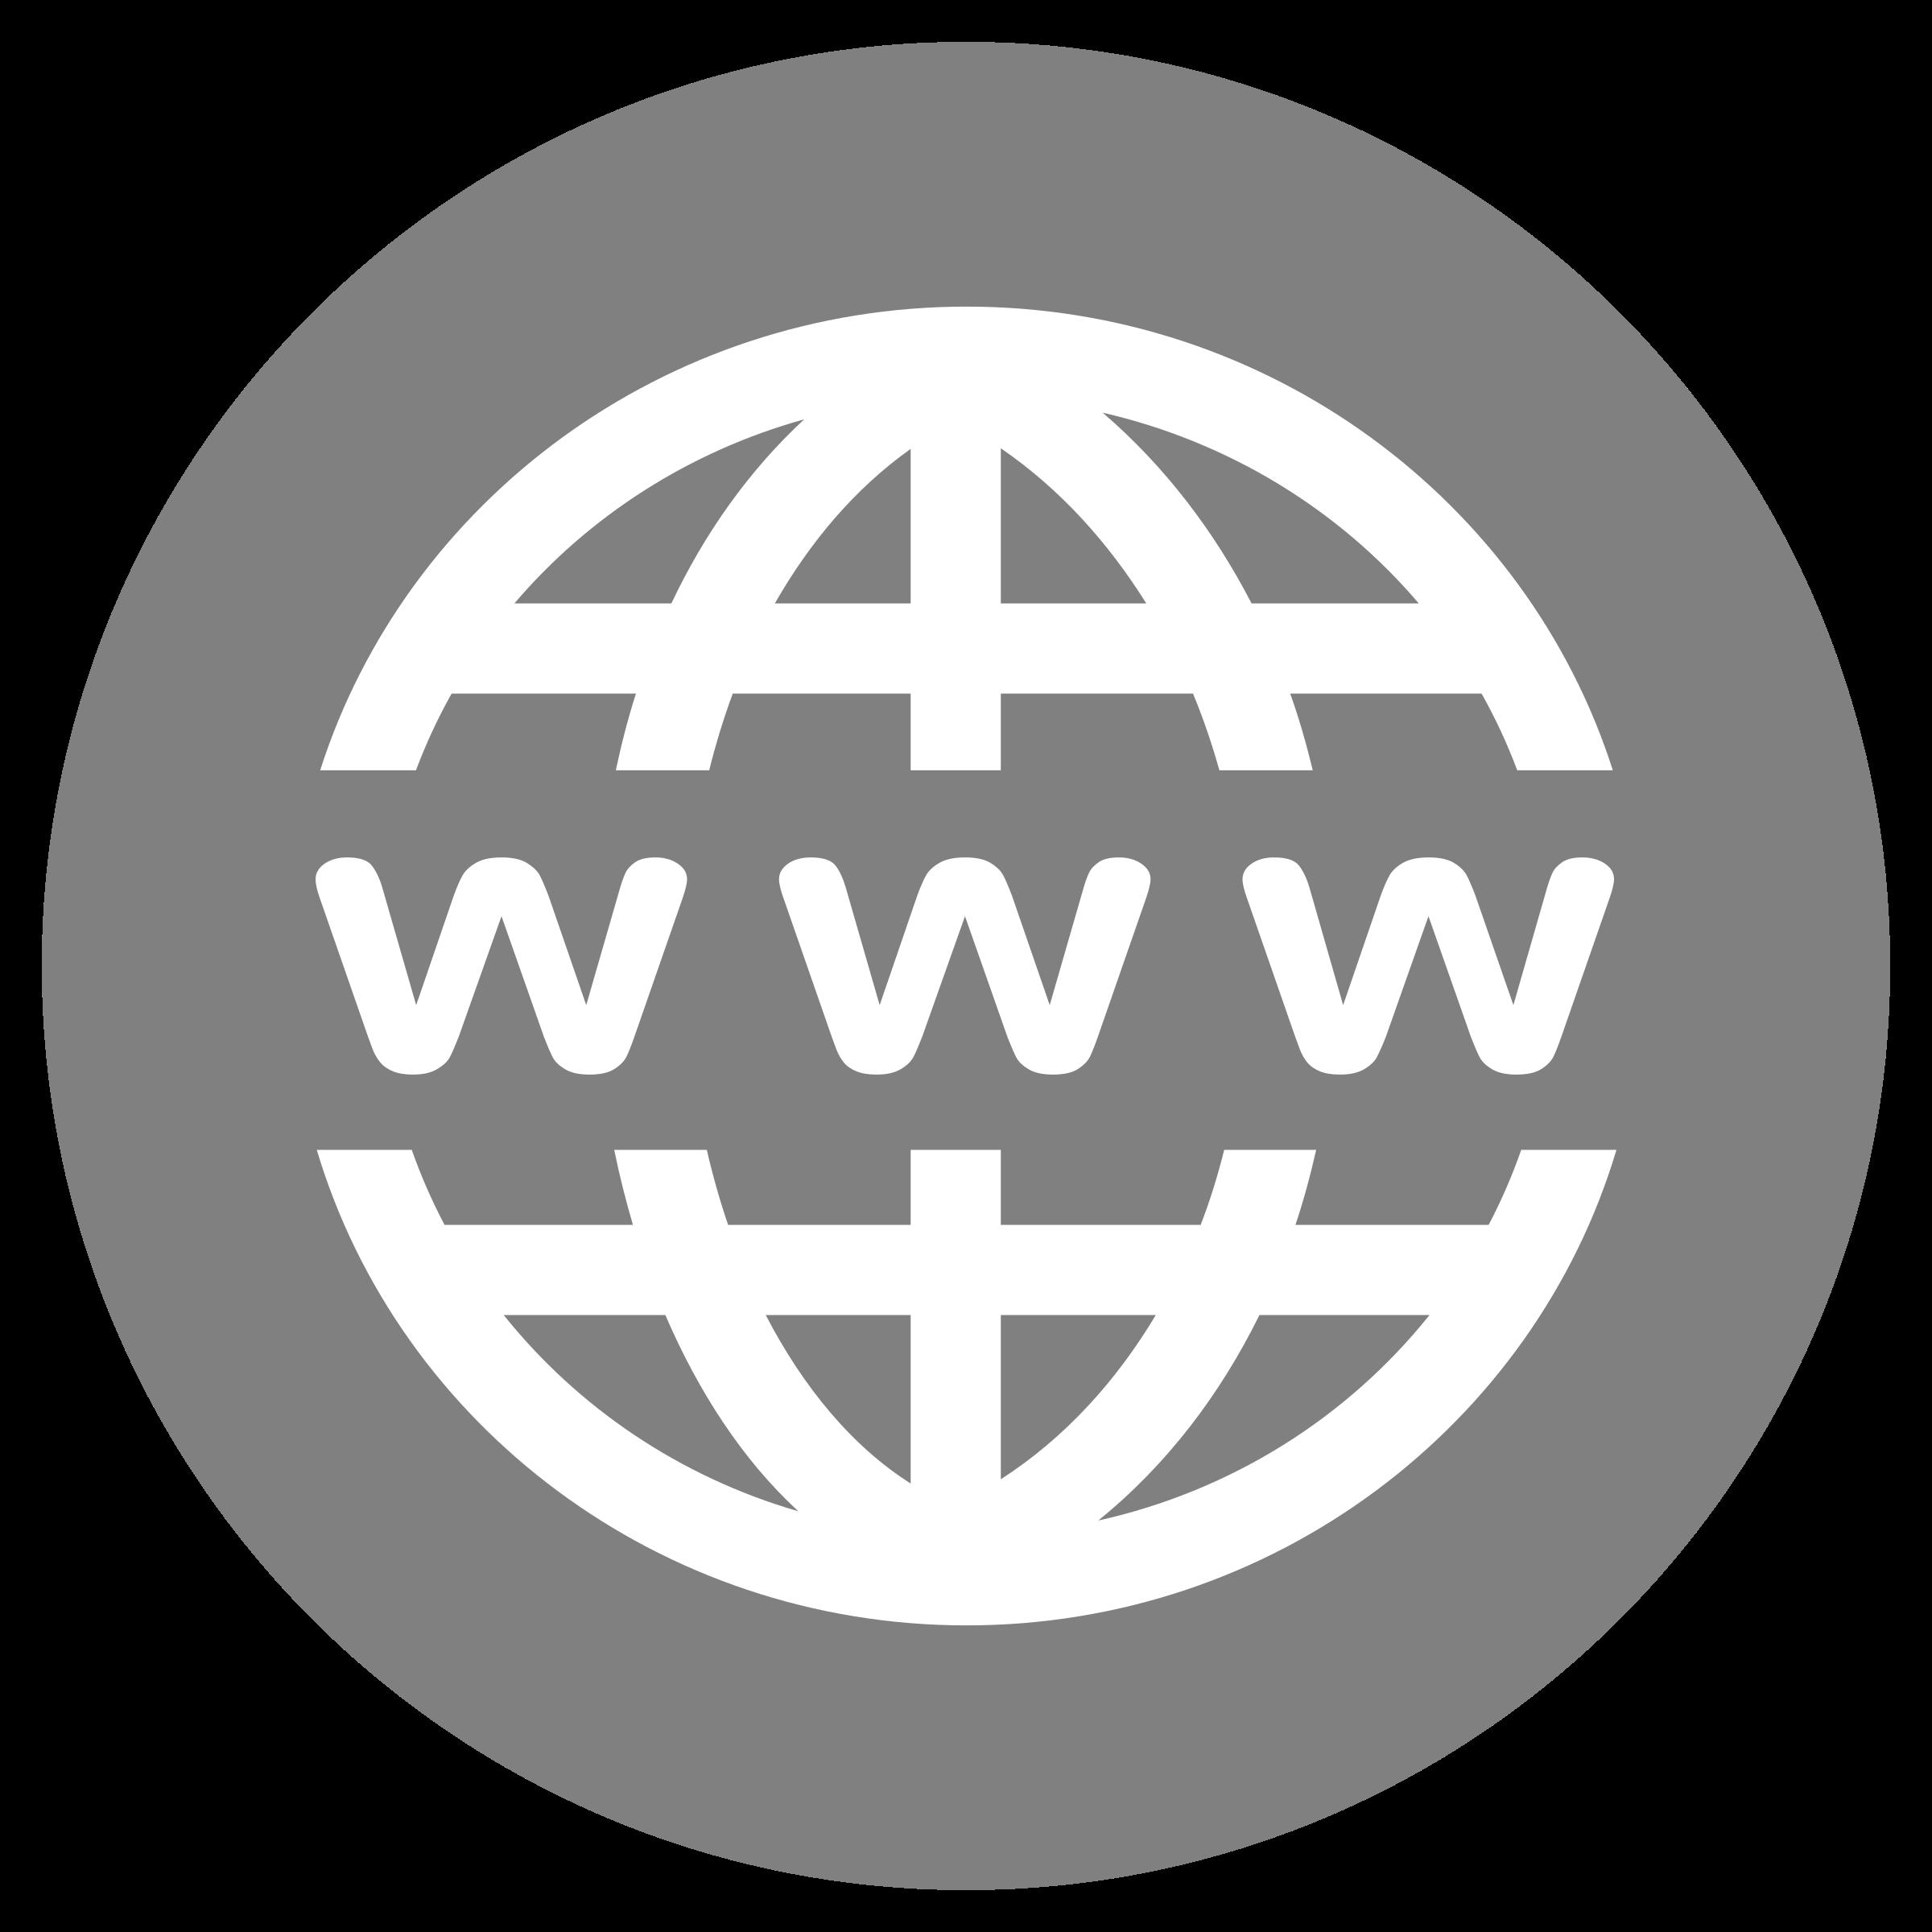 15 internet icon gray images internet icon grey